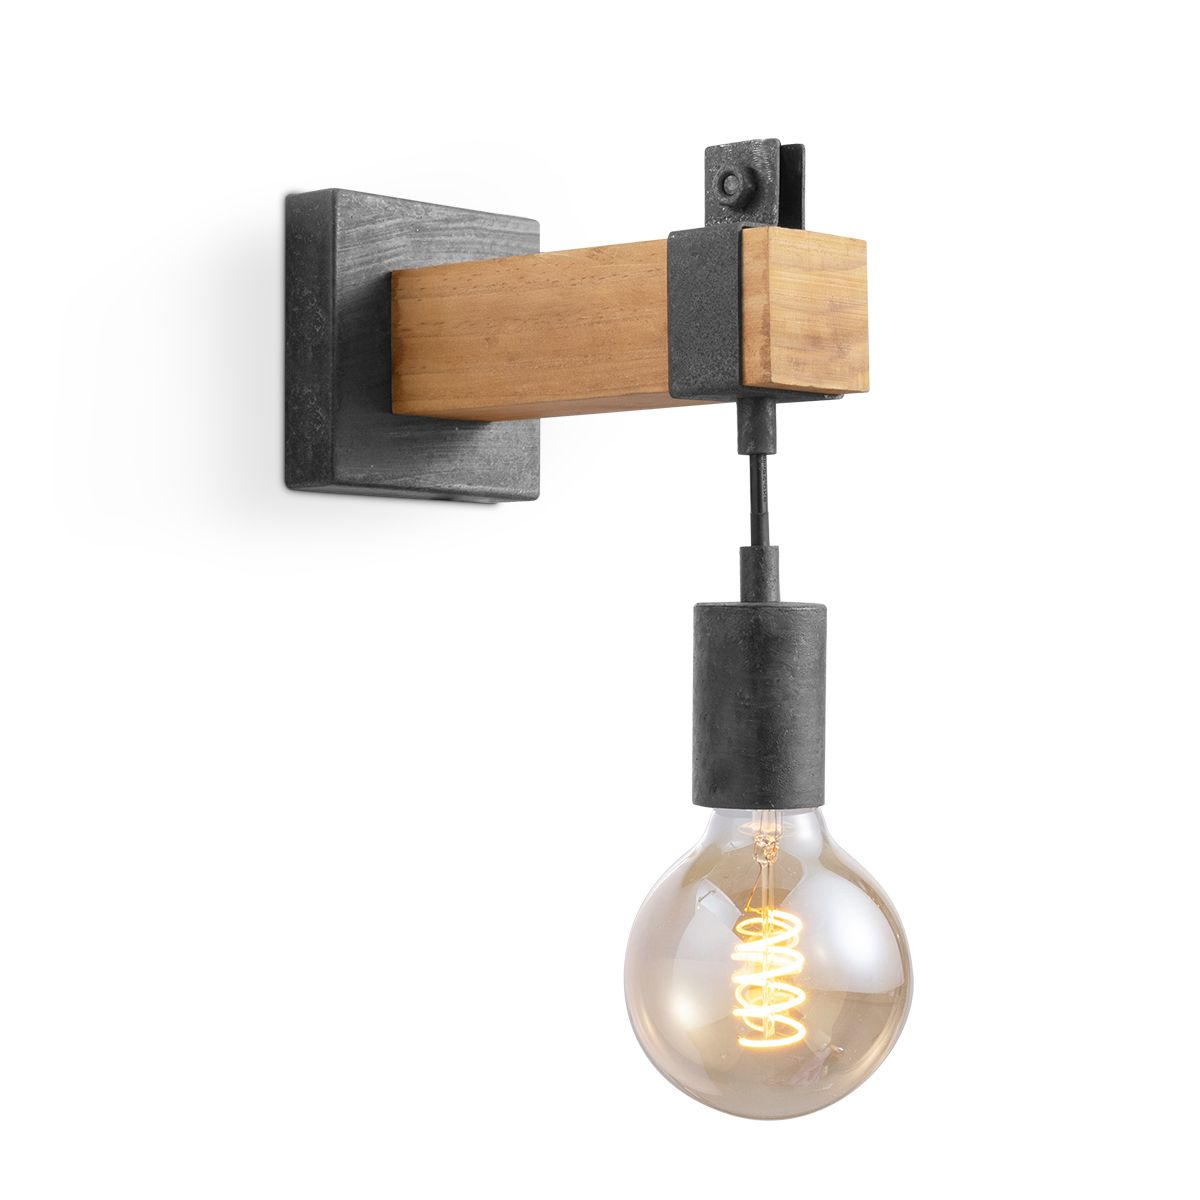 Home sweet home wandlamp Denton 1L - hout - burned metal